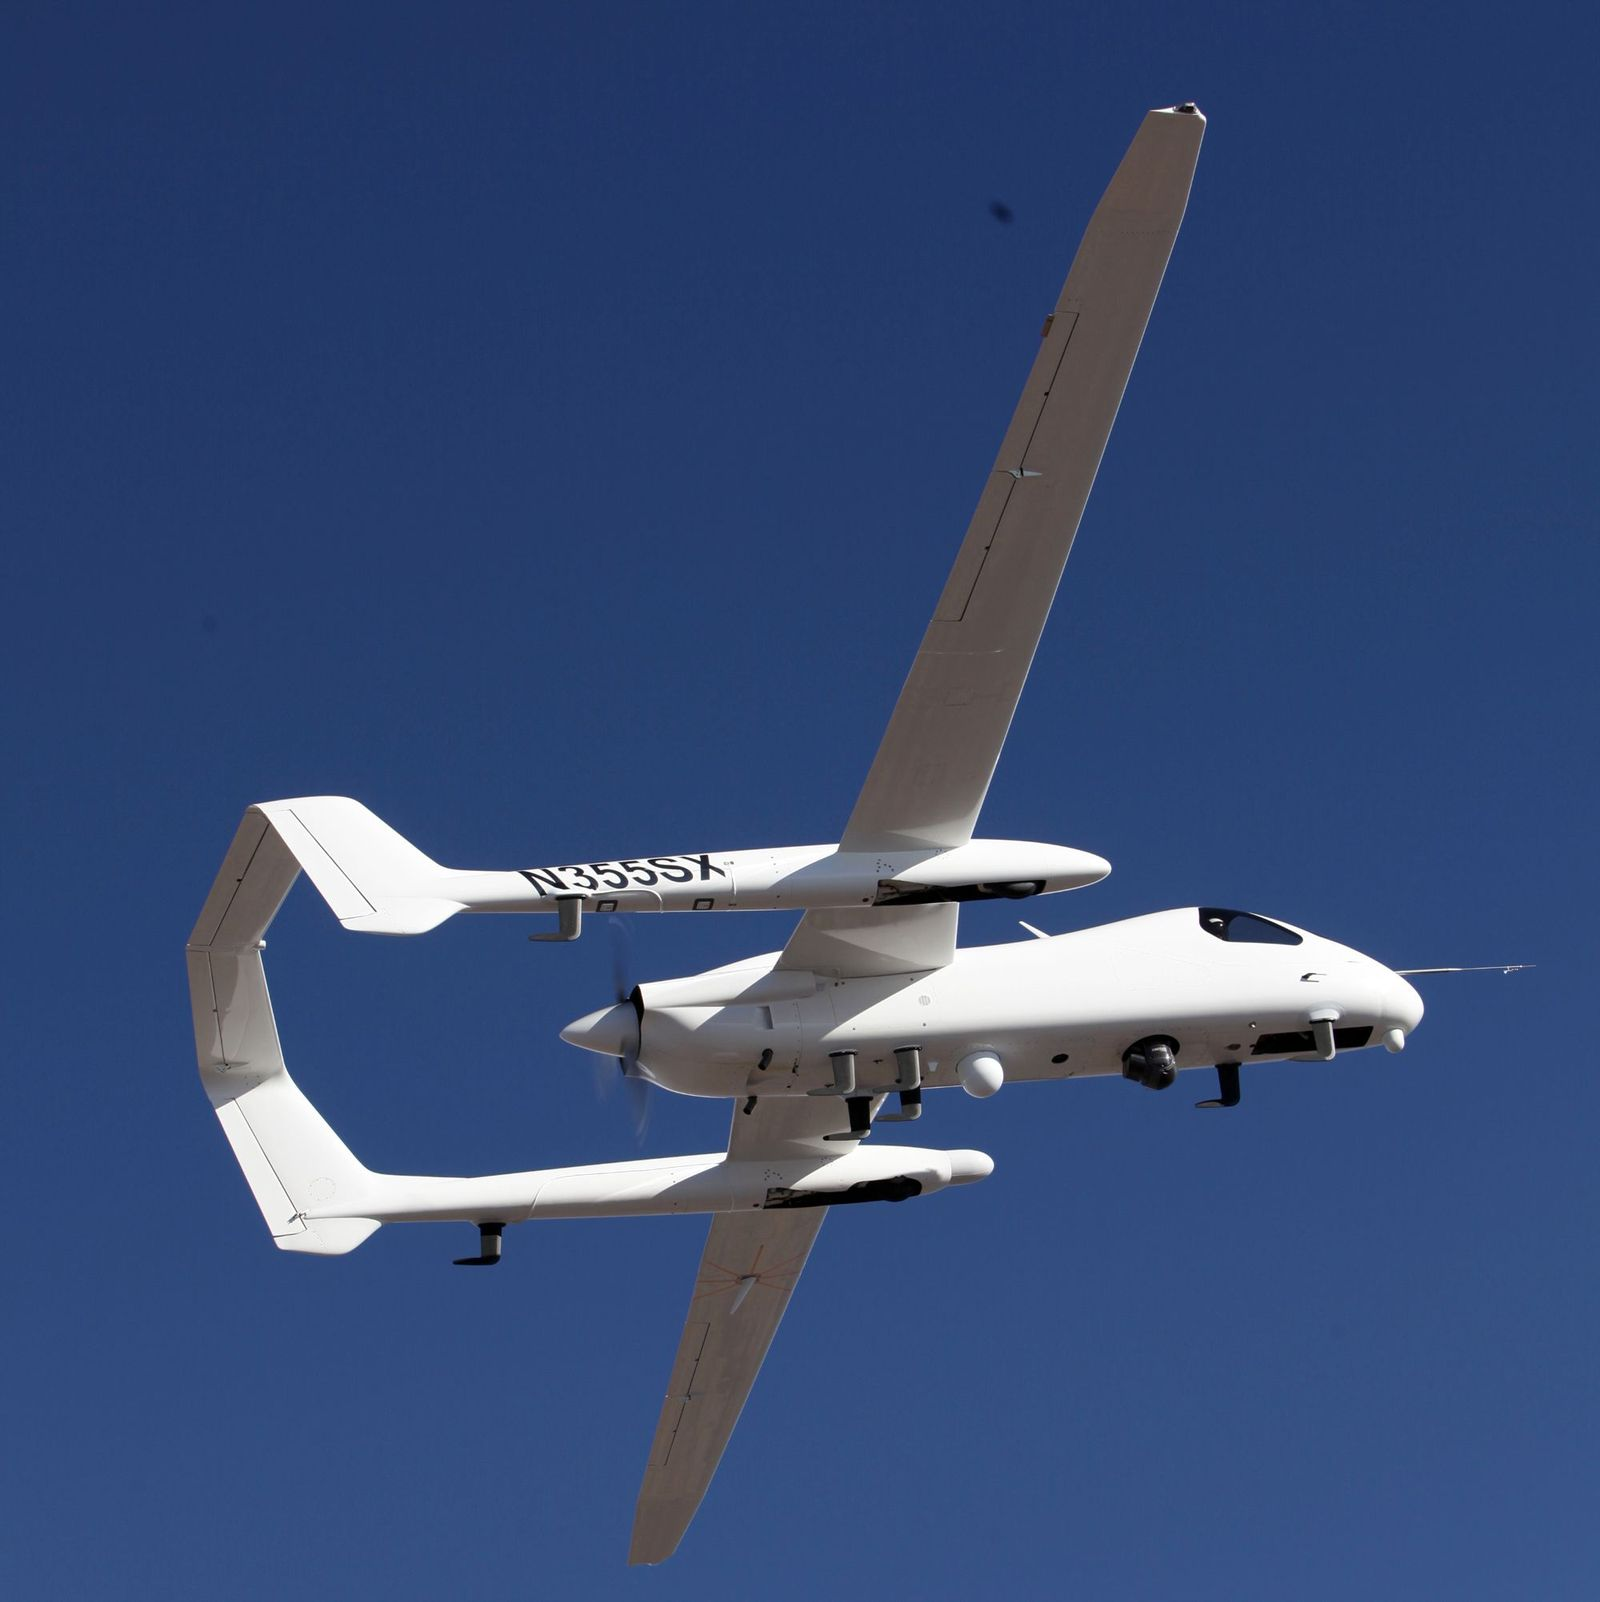 Firebird / Northrop Grumman / Drohne